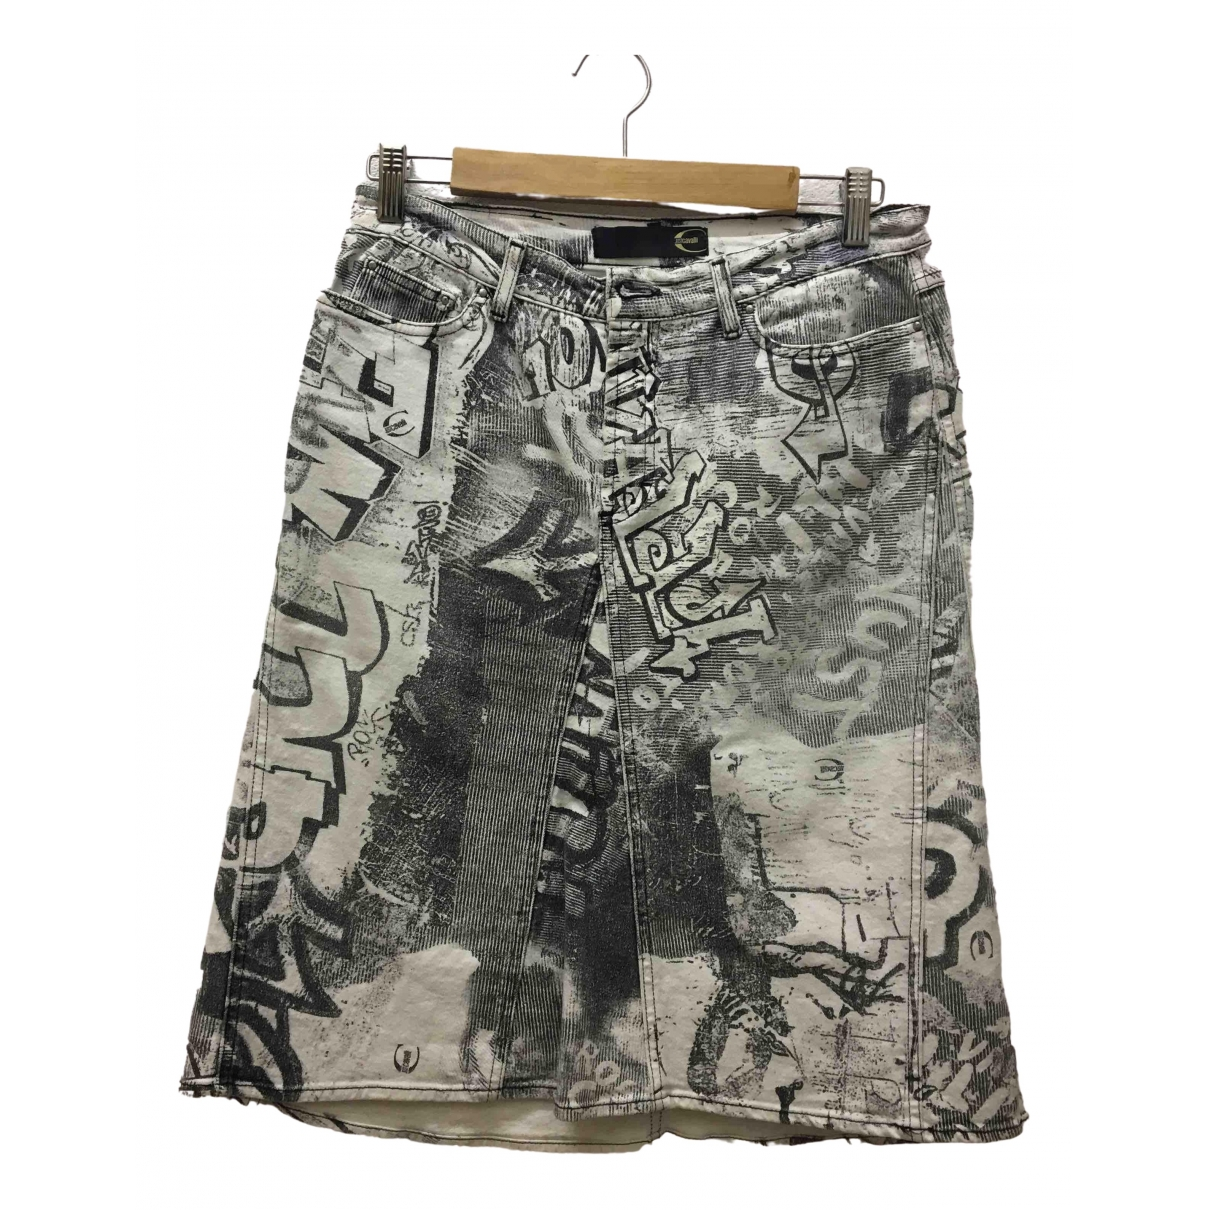 Just Cavalli \N Grey Denim - Jeans skirt for Women 44 IT